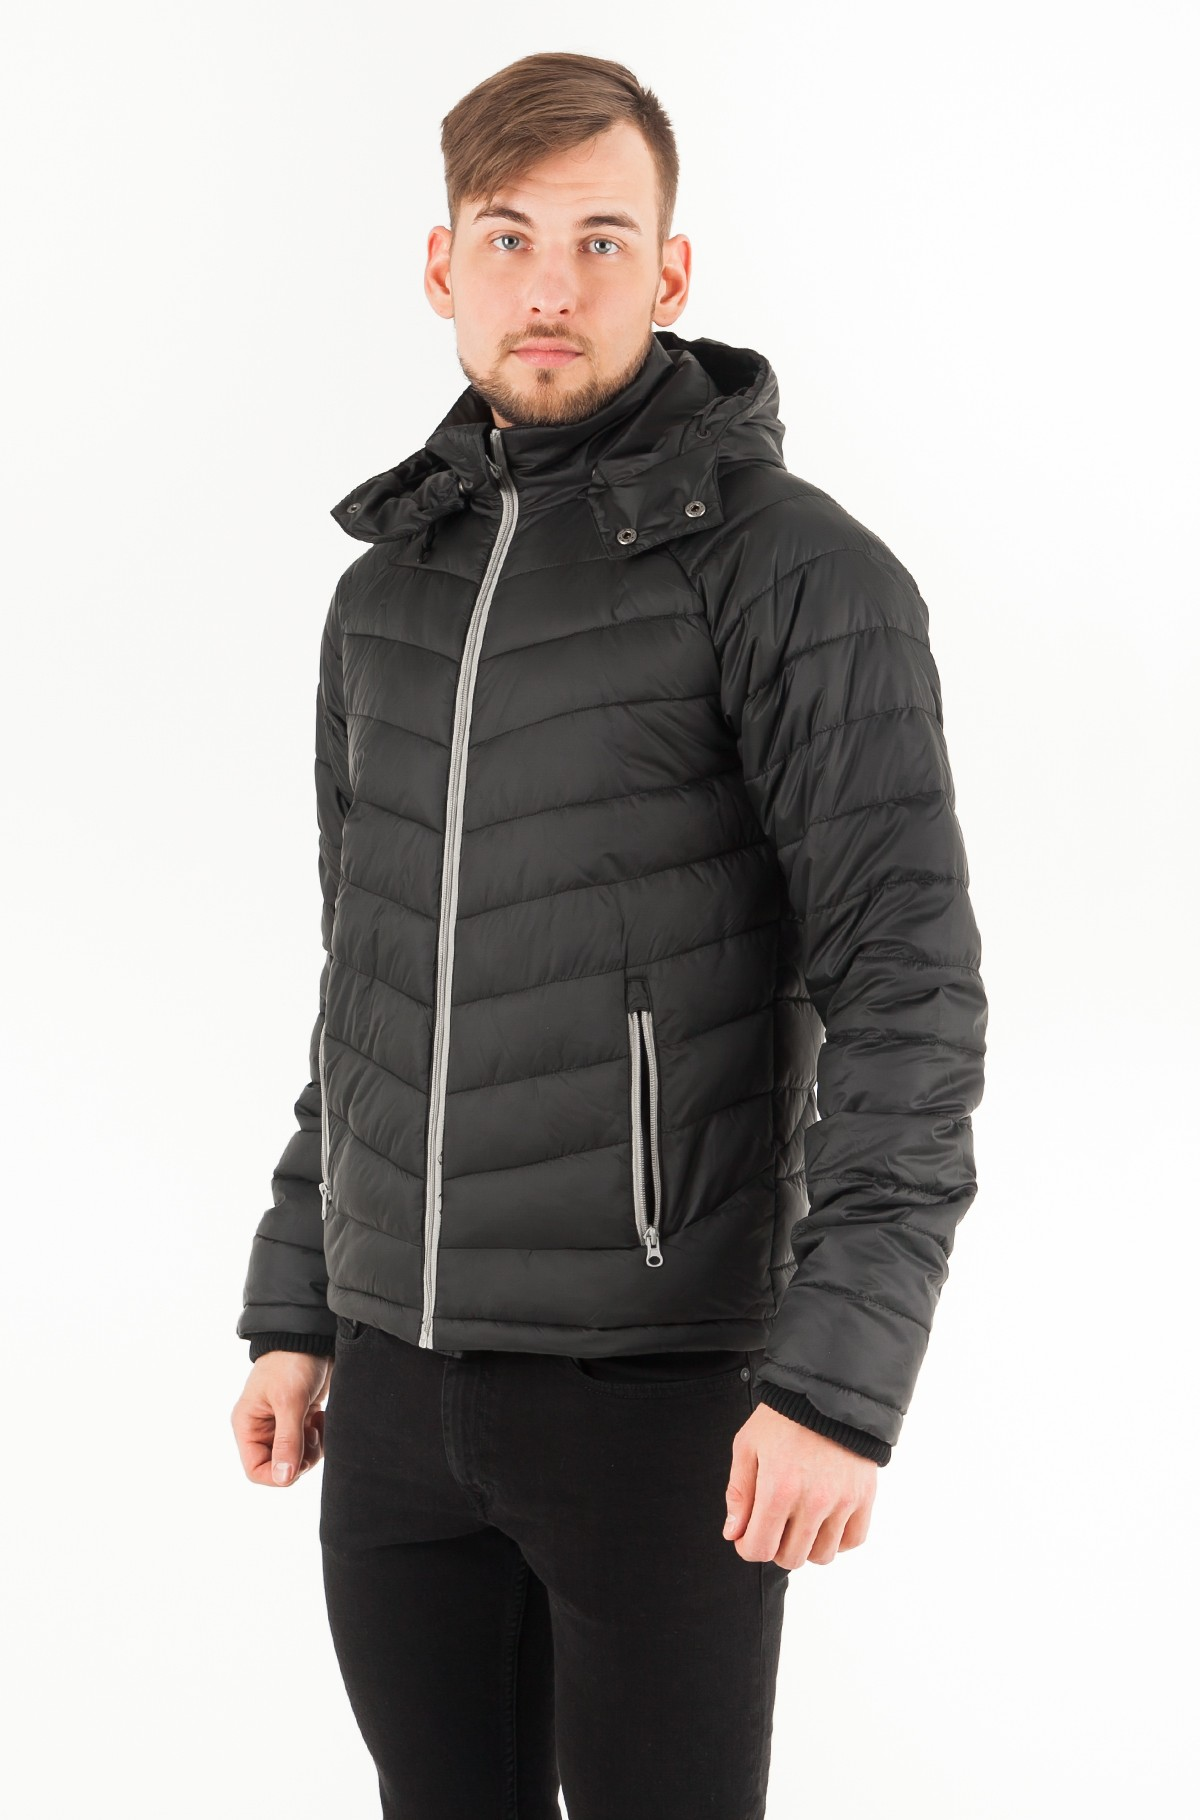 Jacket 150244-full-1